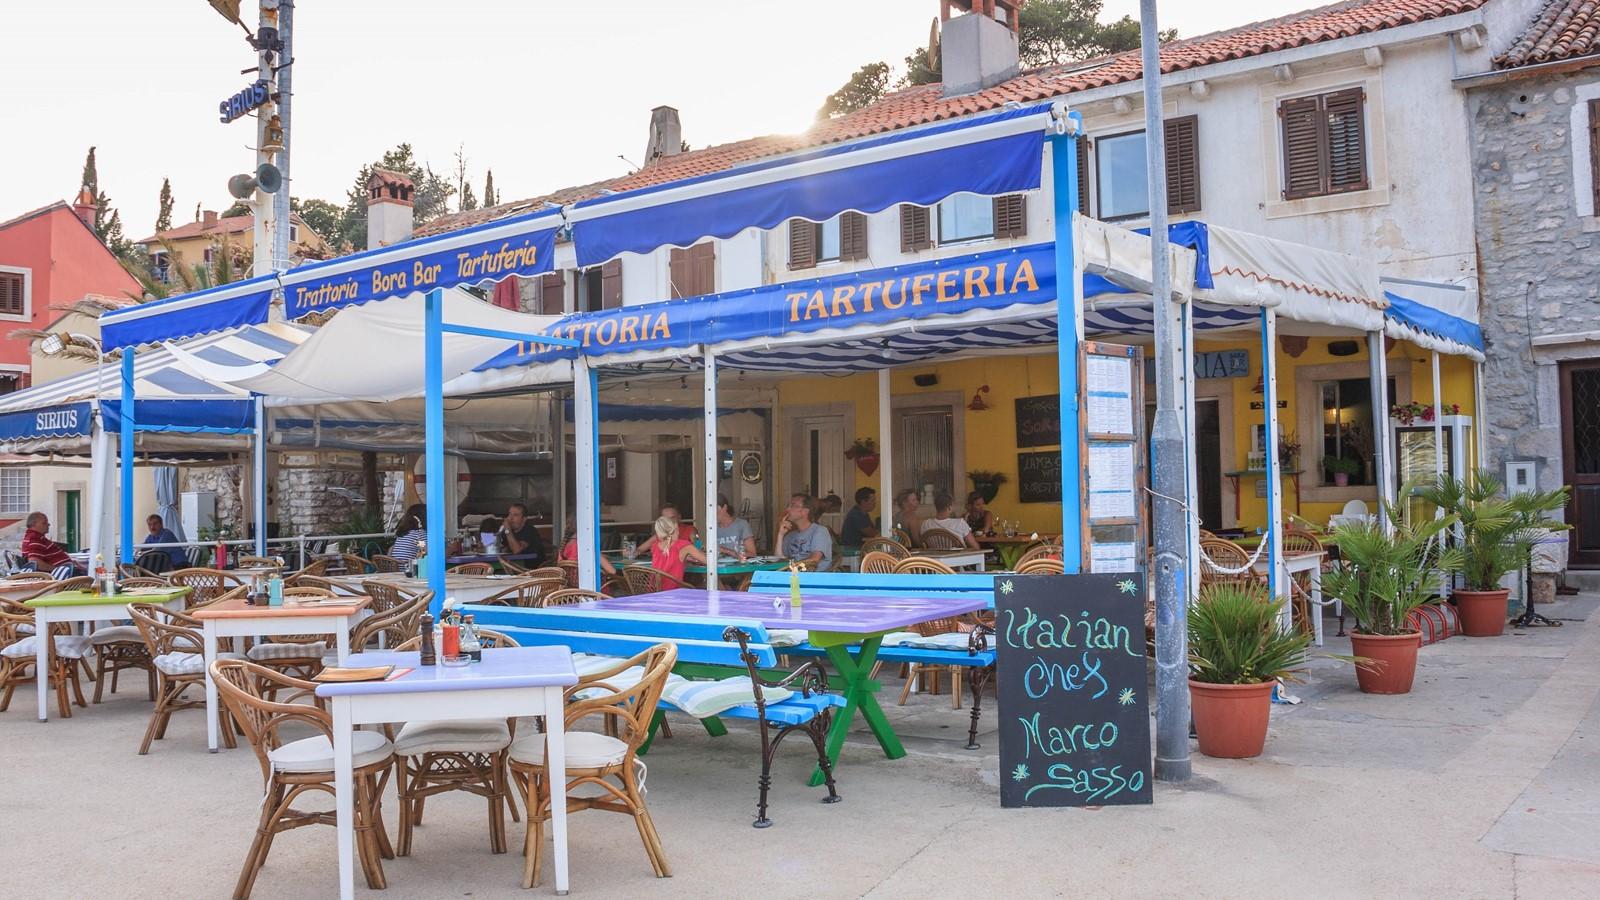 Bora bar (tavern)